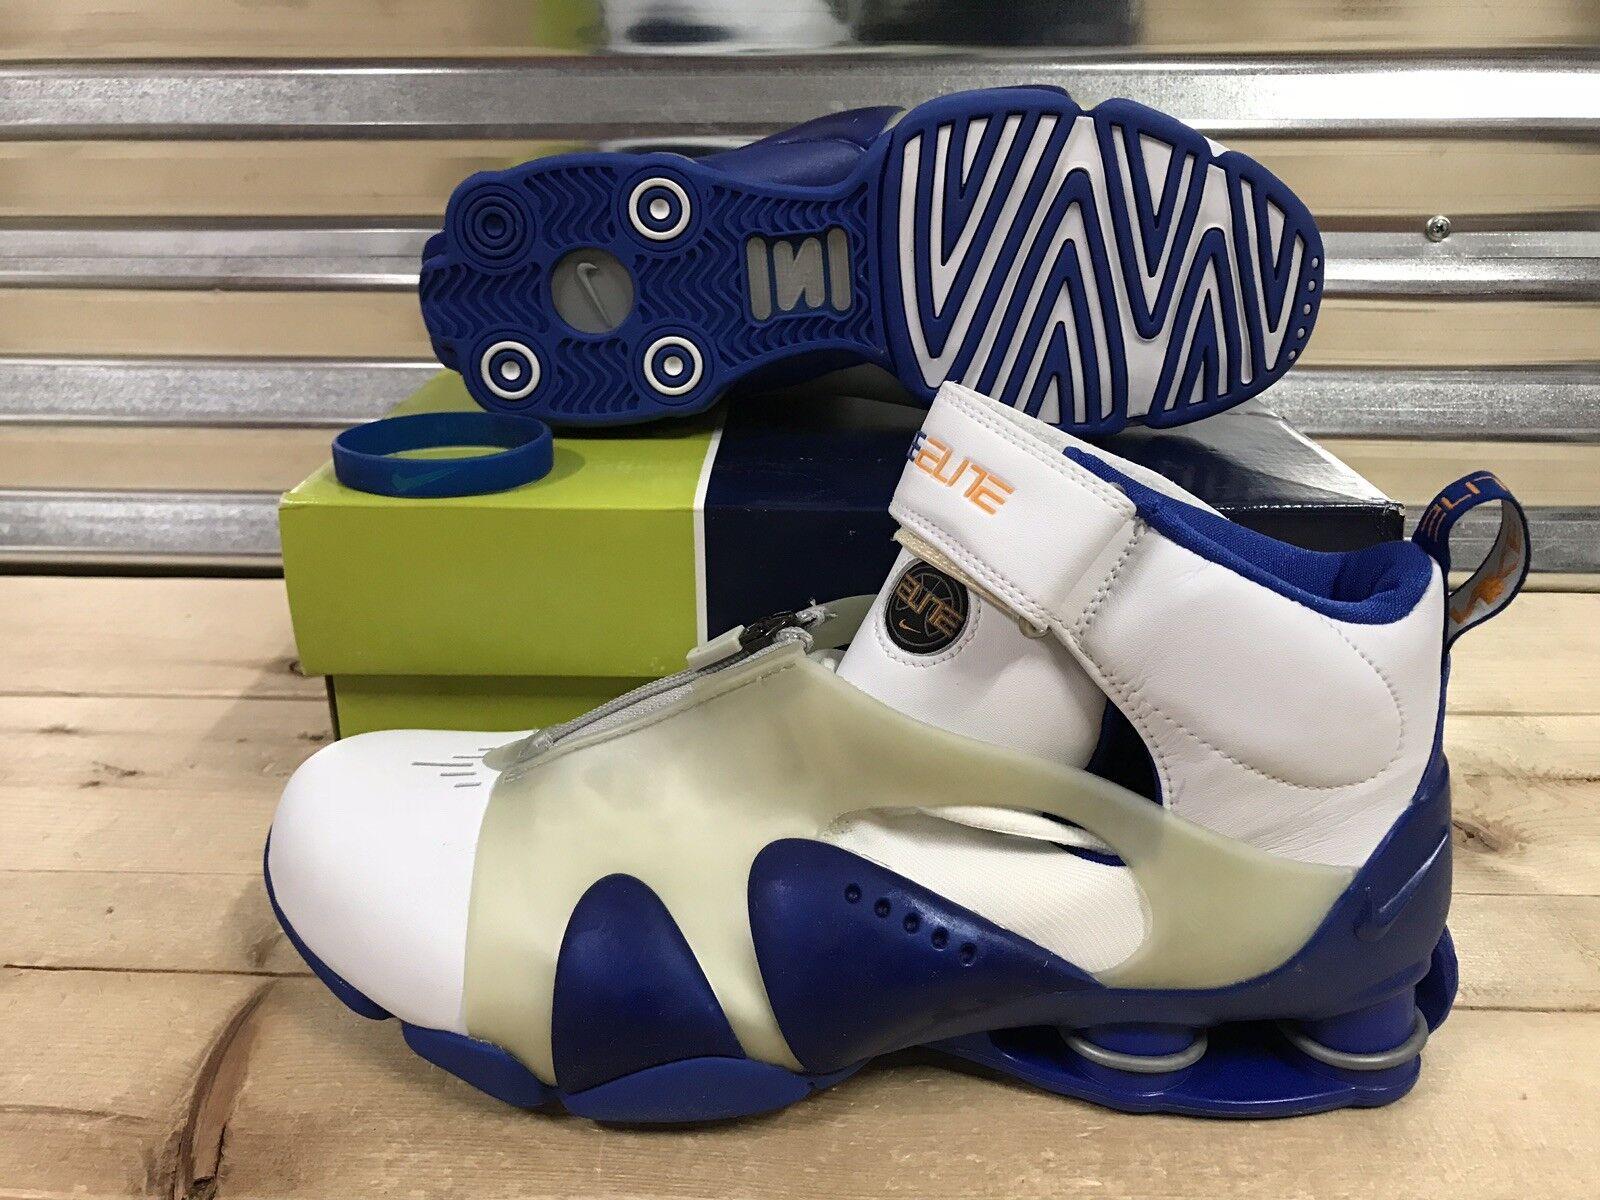 Nike Shox Stunner PR Retro 2002 shoes VC Vince White bluee SZ 11.5 ( 304410-102 )